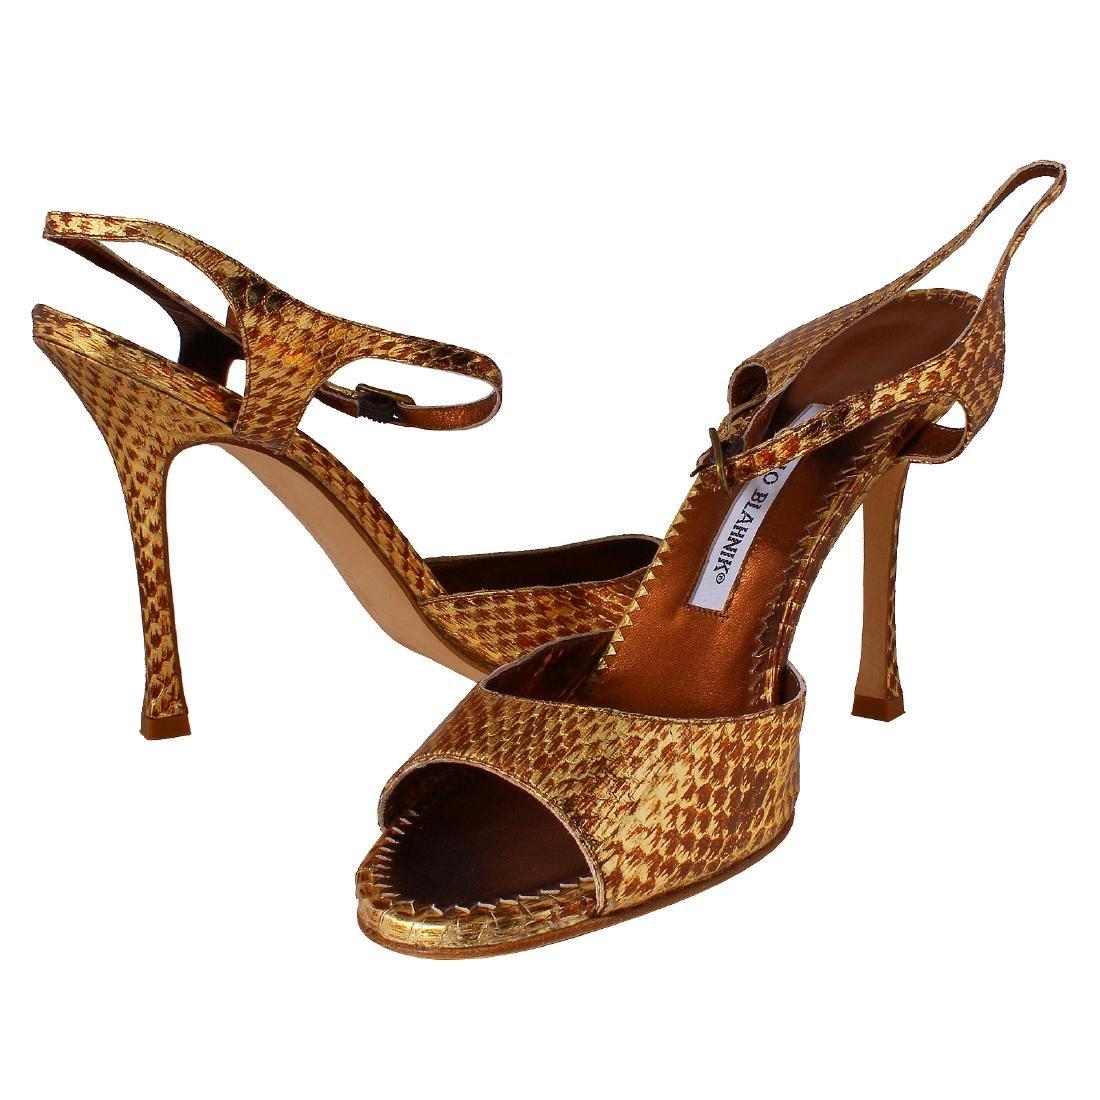 Manolo Blahnik Shoes - Snake Oro Gold Sz 39